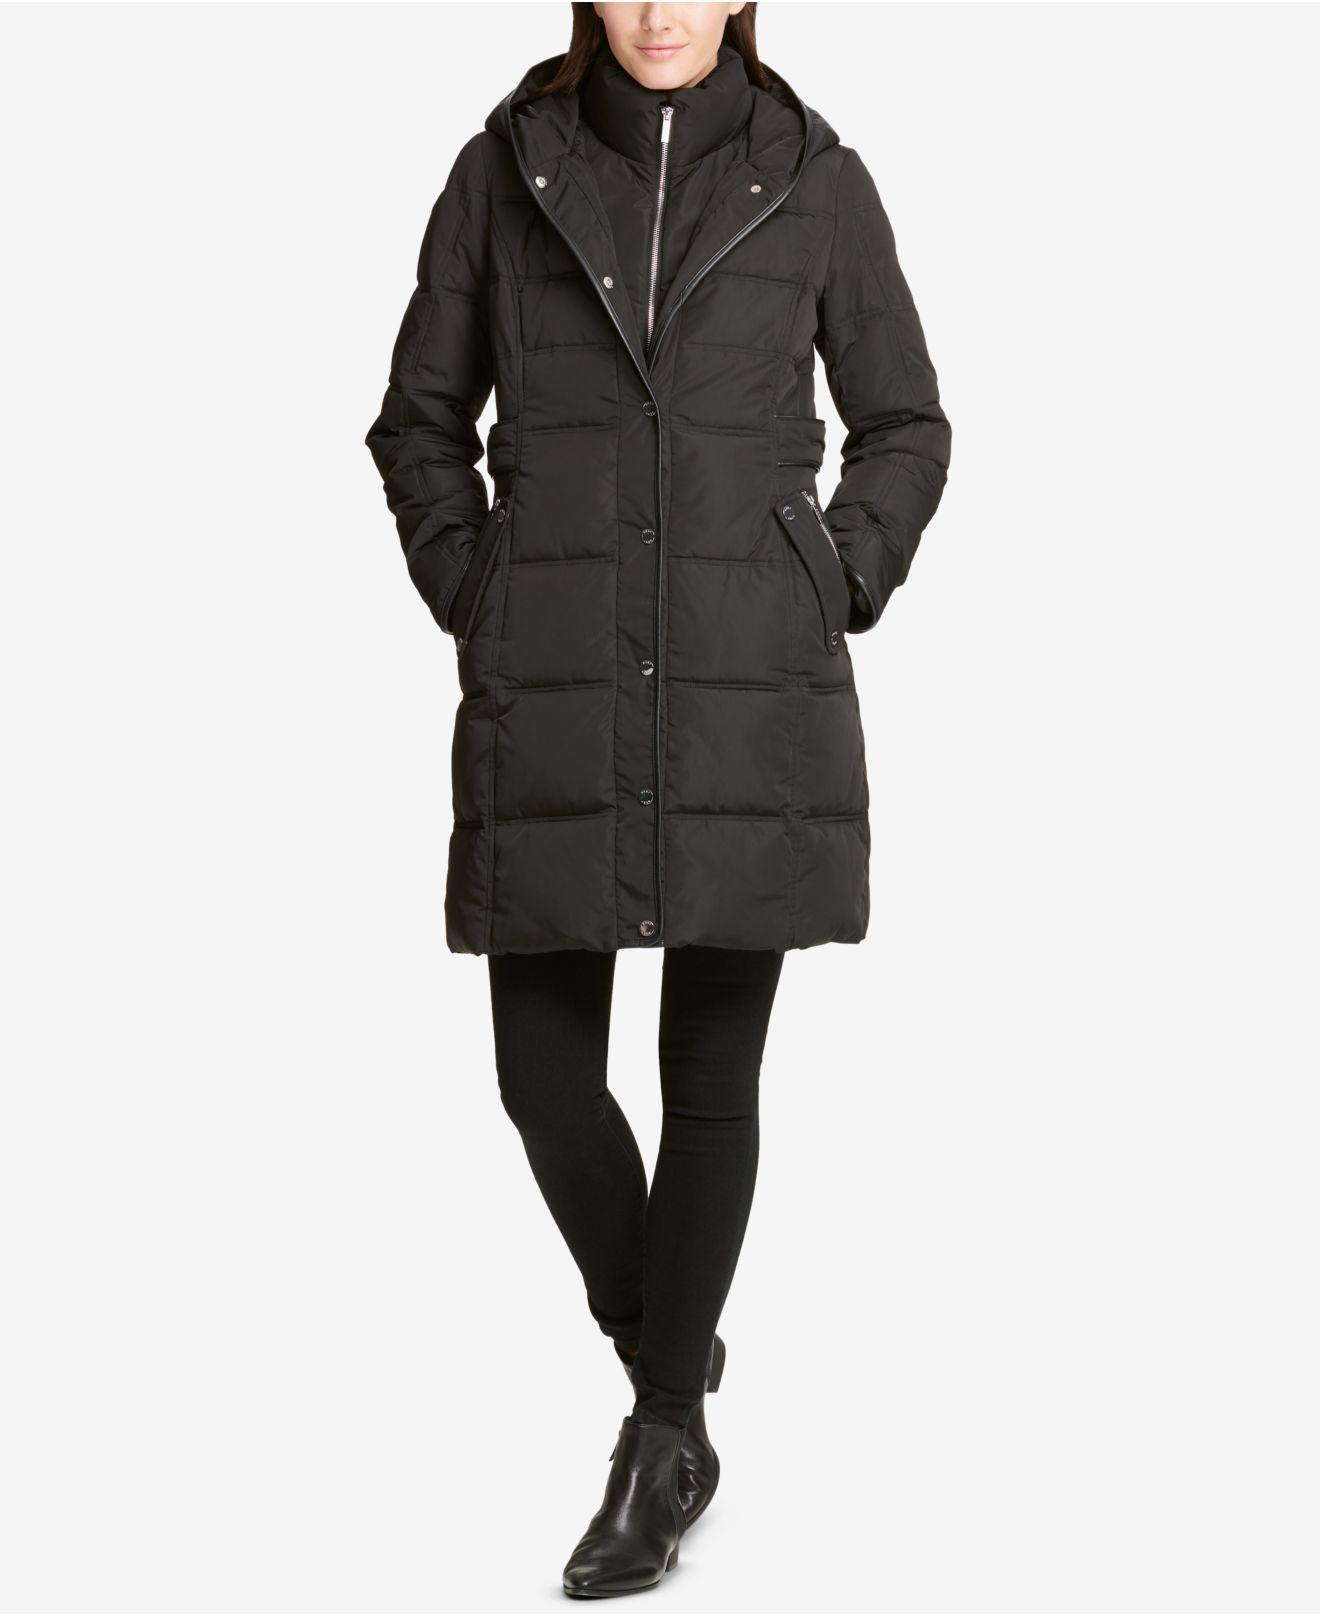 35b871822f723 DKNY. Women s Black Faux-leather-trim Hooded Puffer Coat ...